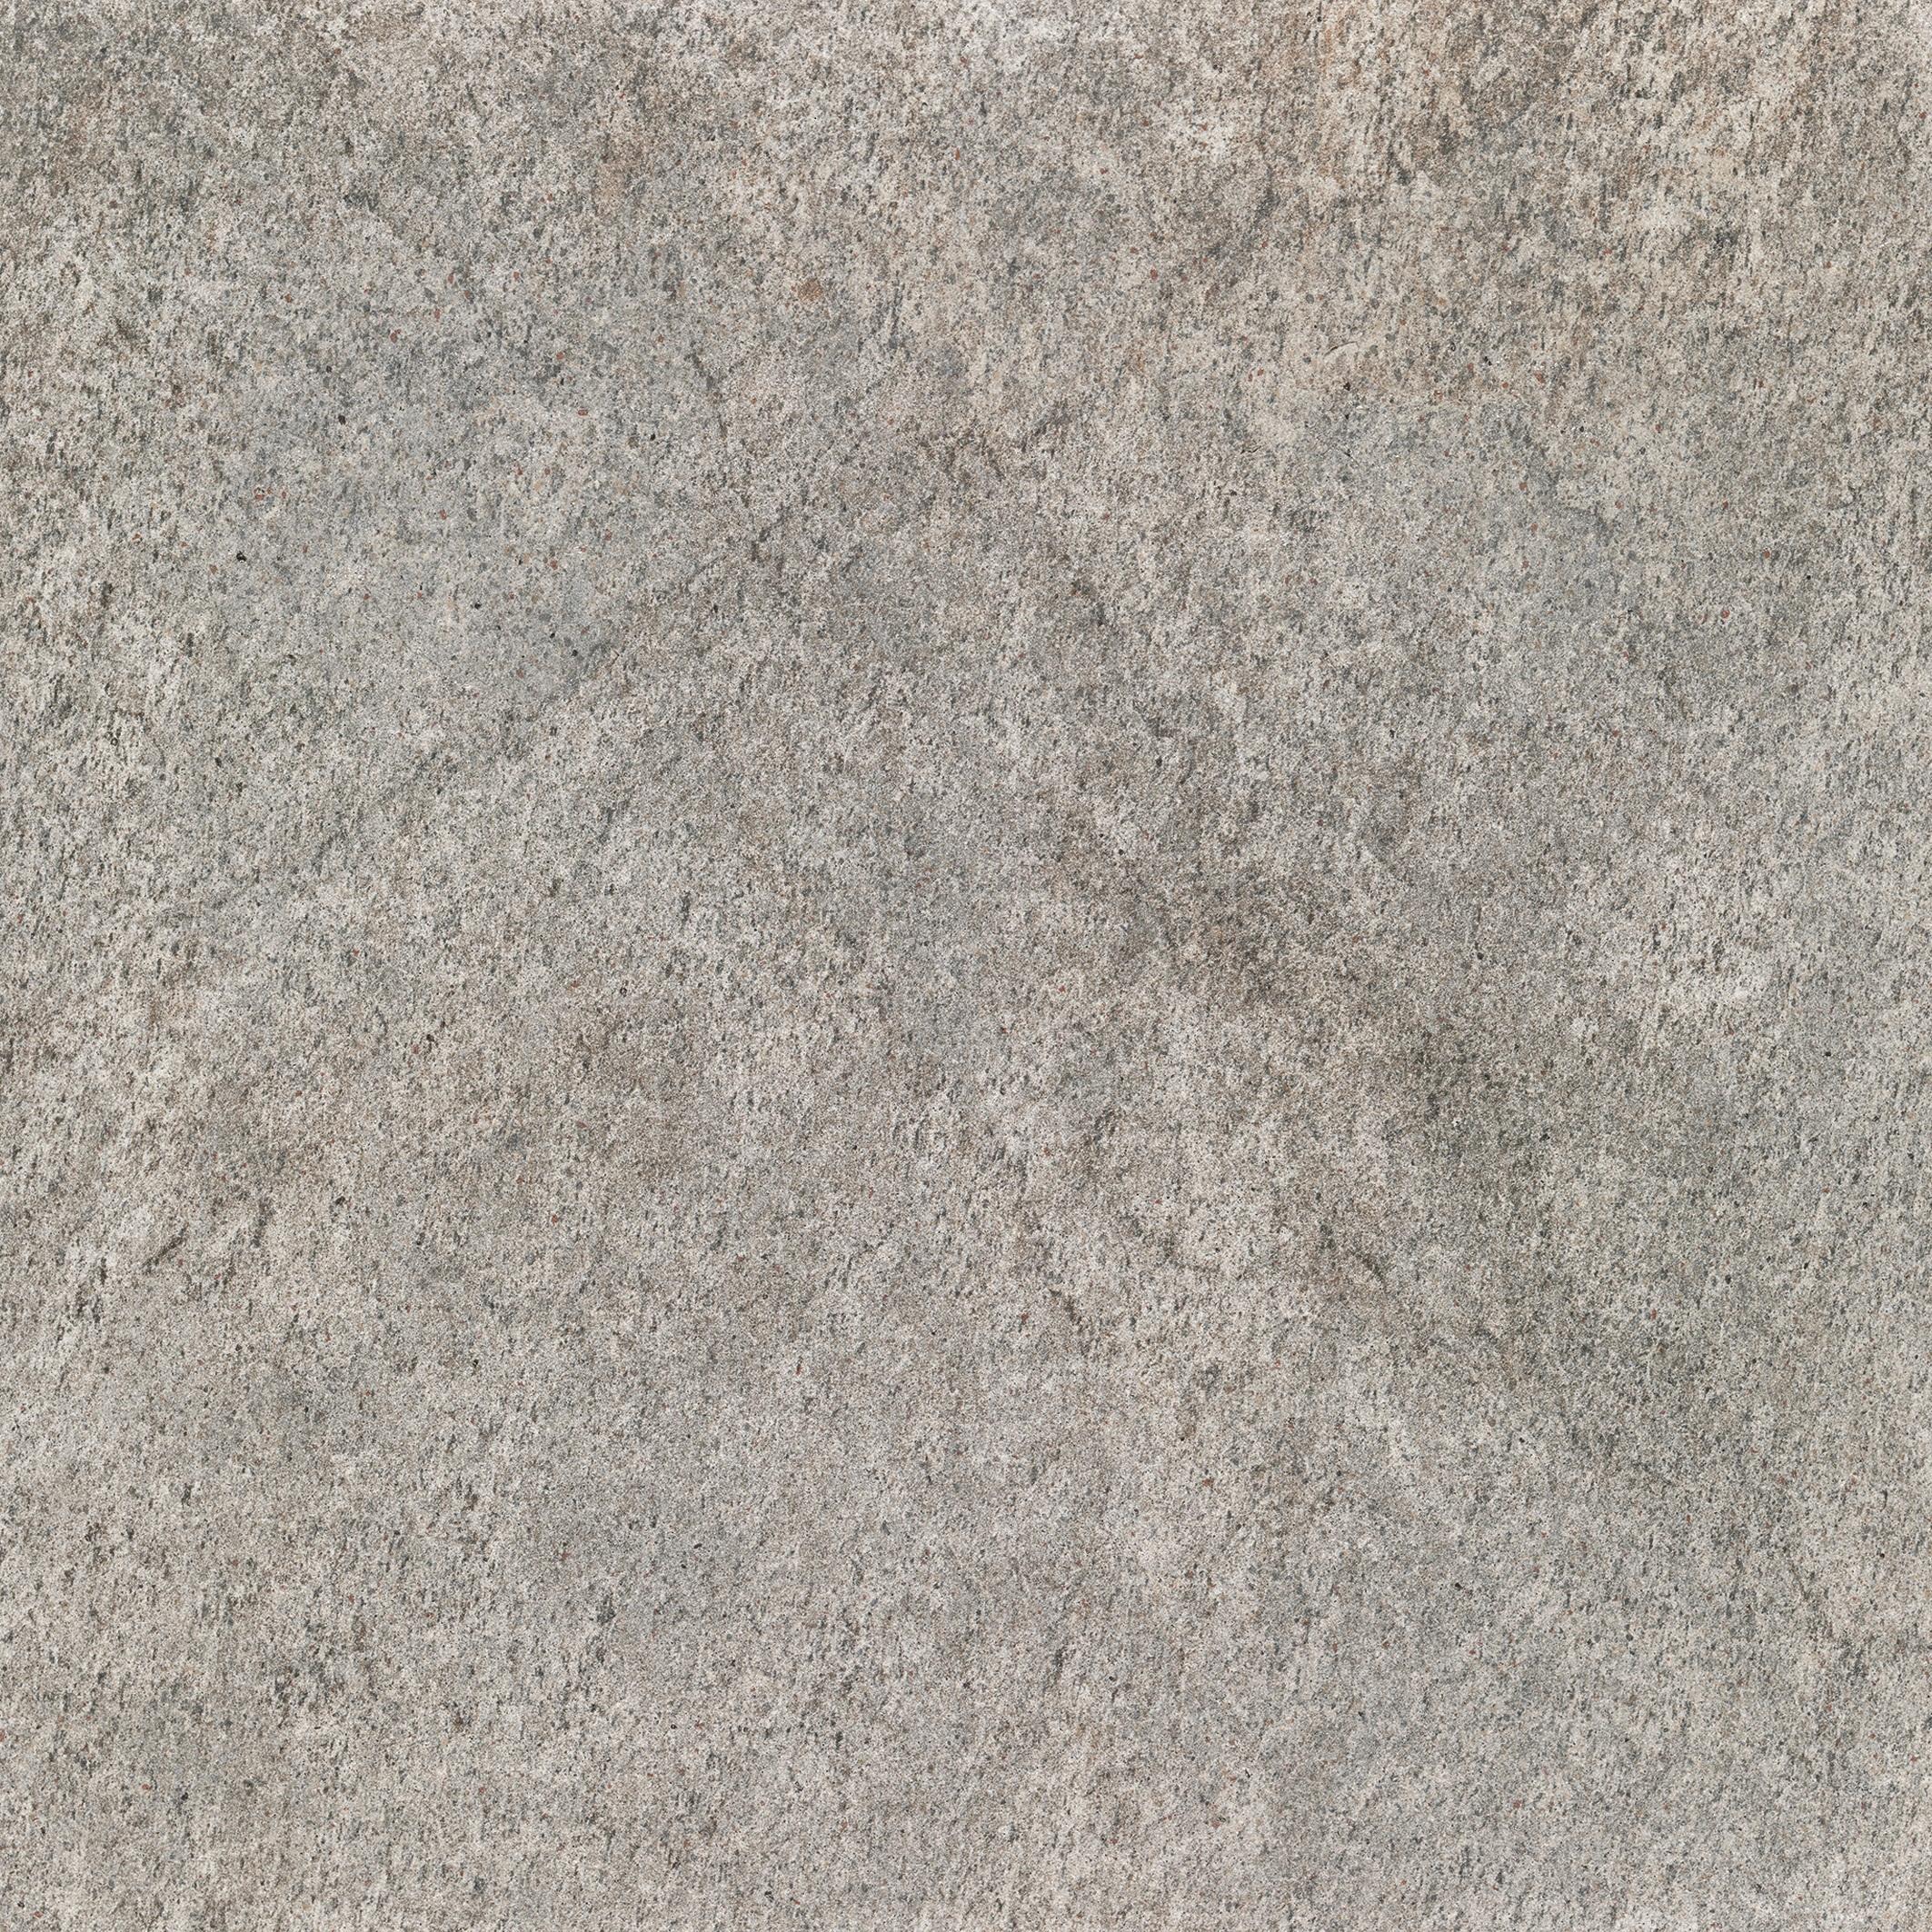 Напольная плитка Venis Cosmos +23192 Pav. напольная плитка fanal pav marengo 01 32 5х32 5